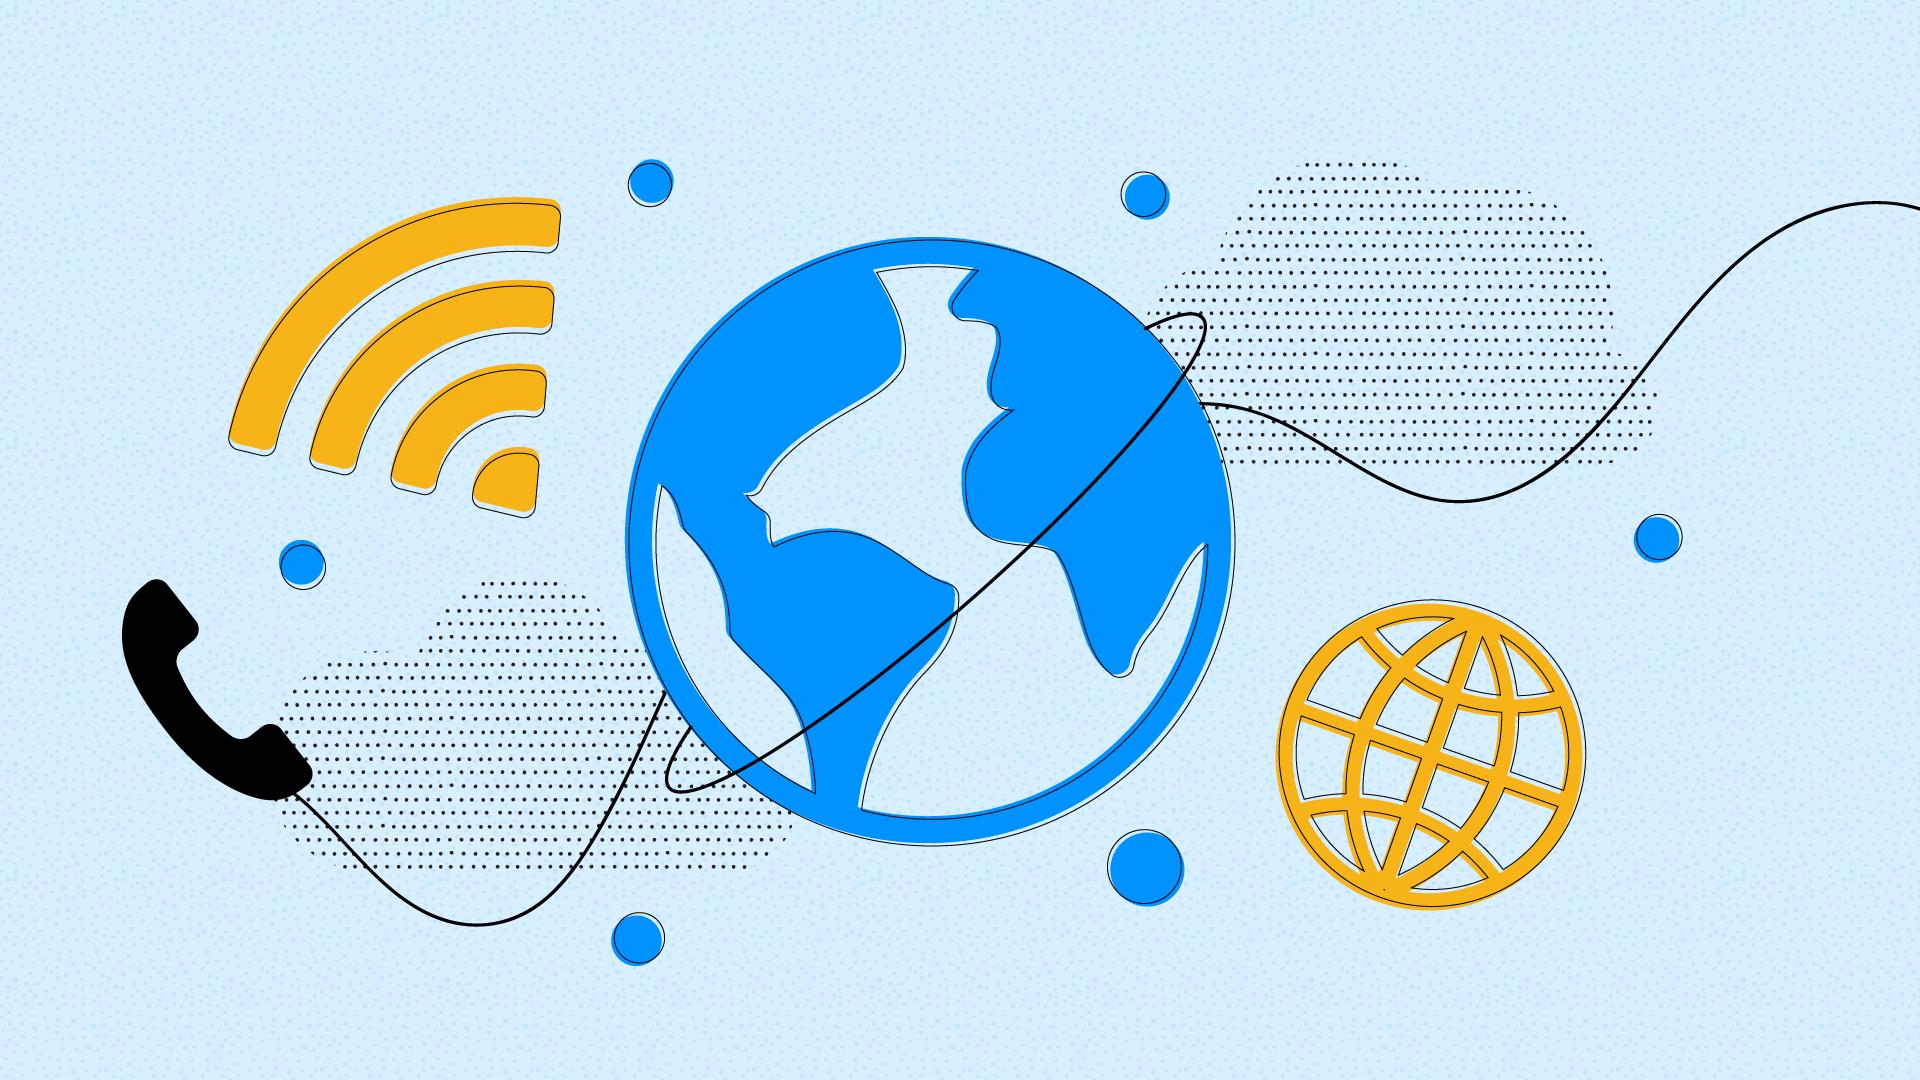 ما هي مكالمات واي فاي؟